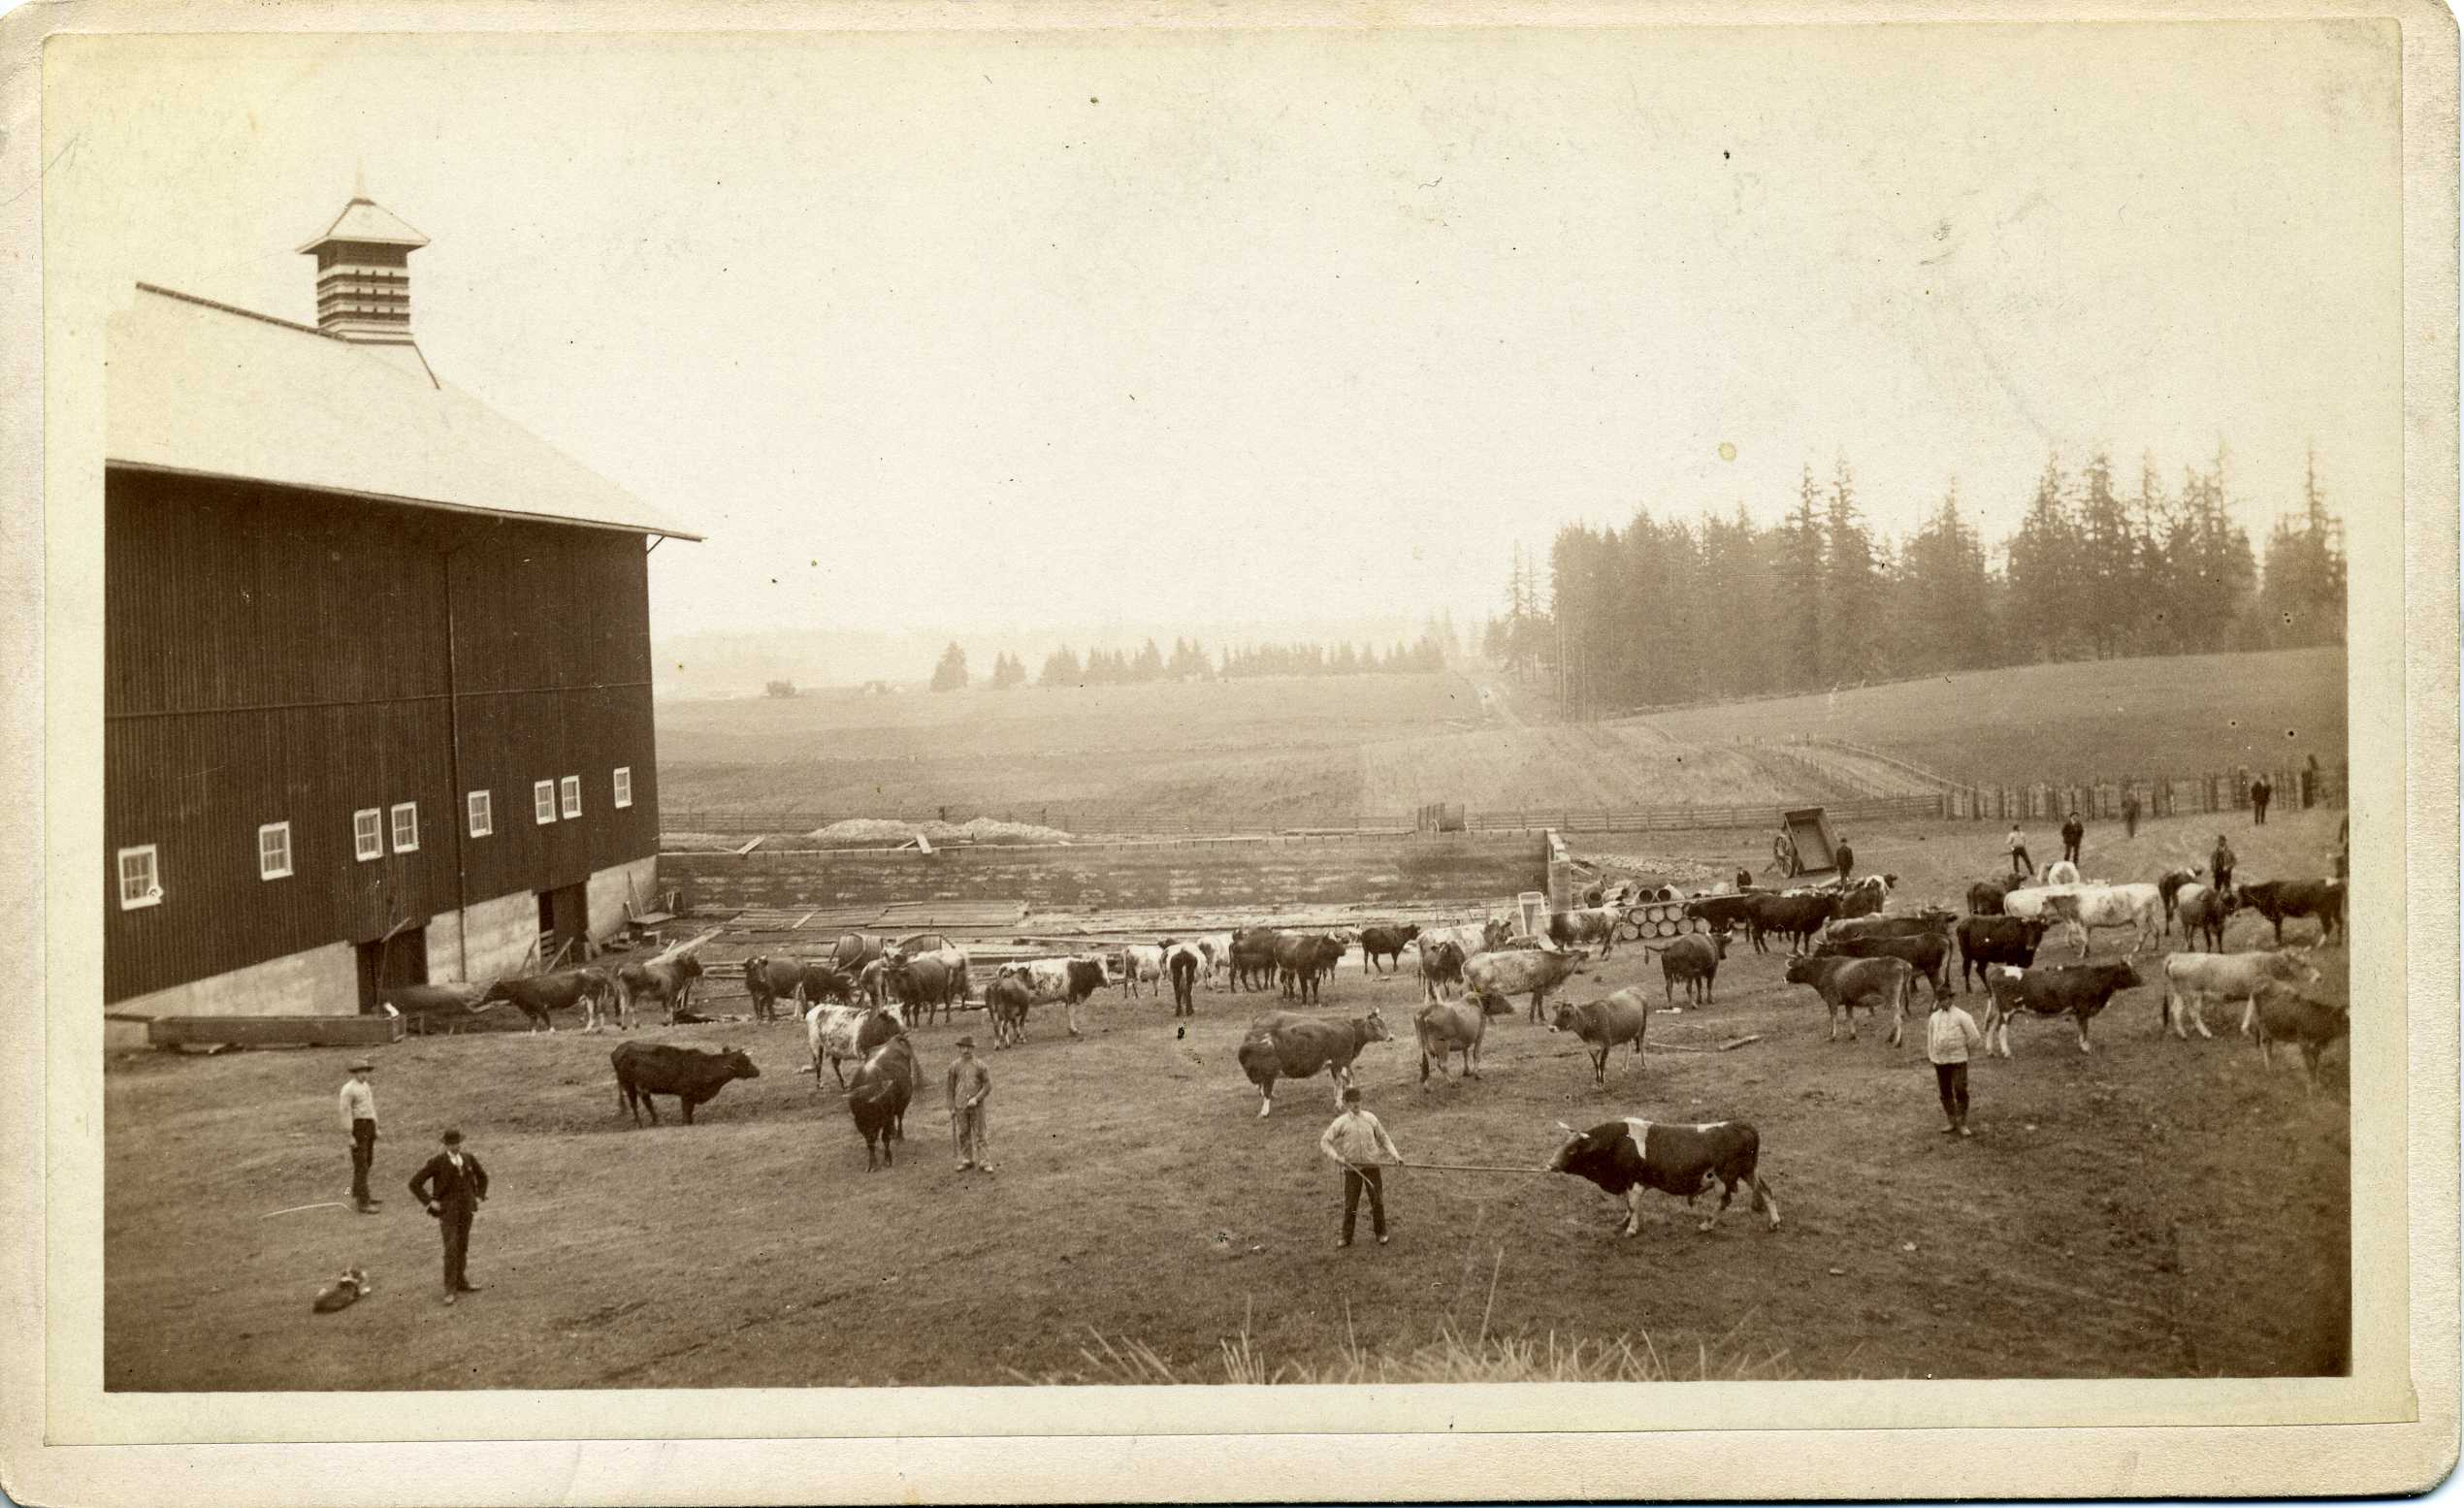 Ladd Hazelfern Farm